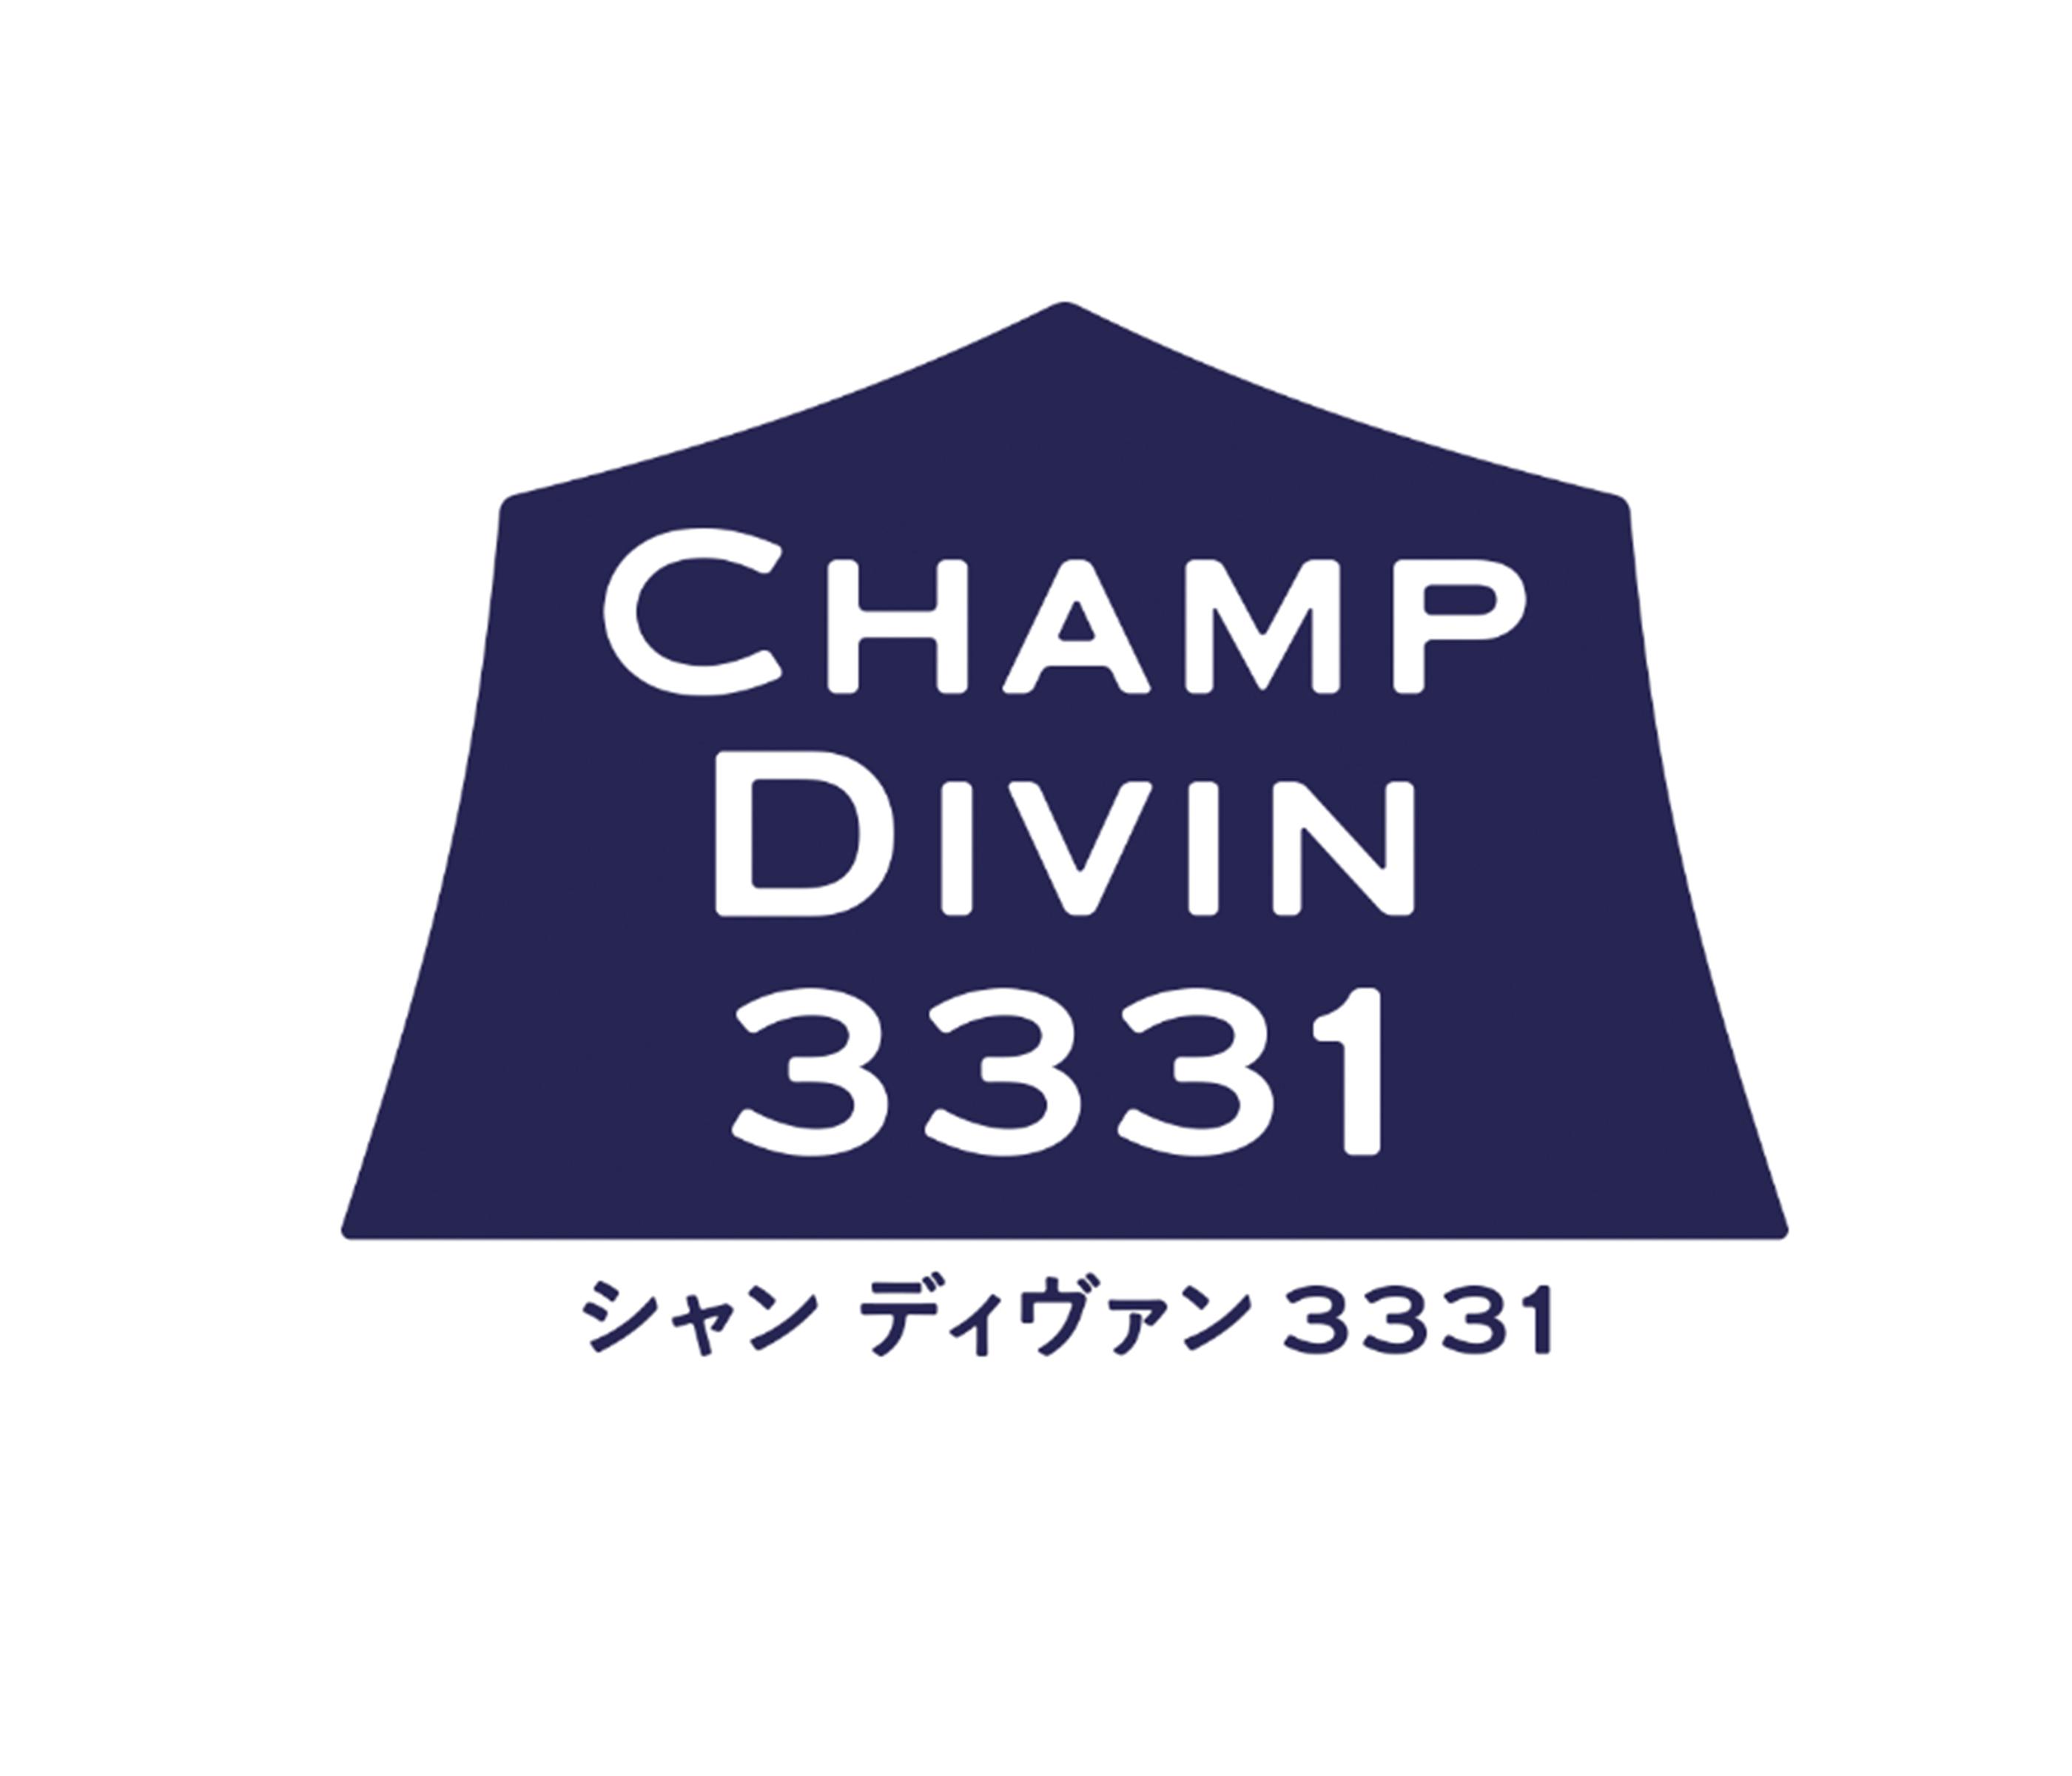 CHAMP DIVIN 3331(シャンディヴァン3331)